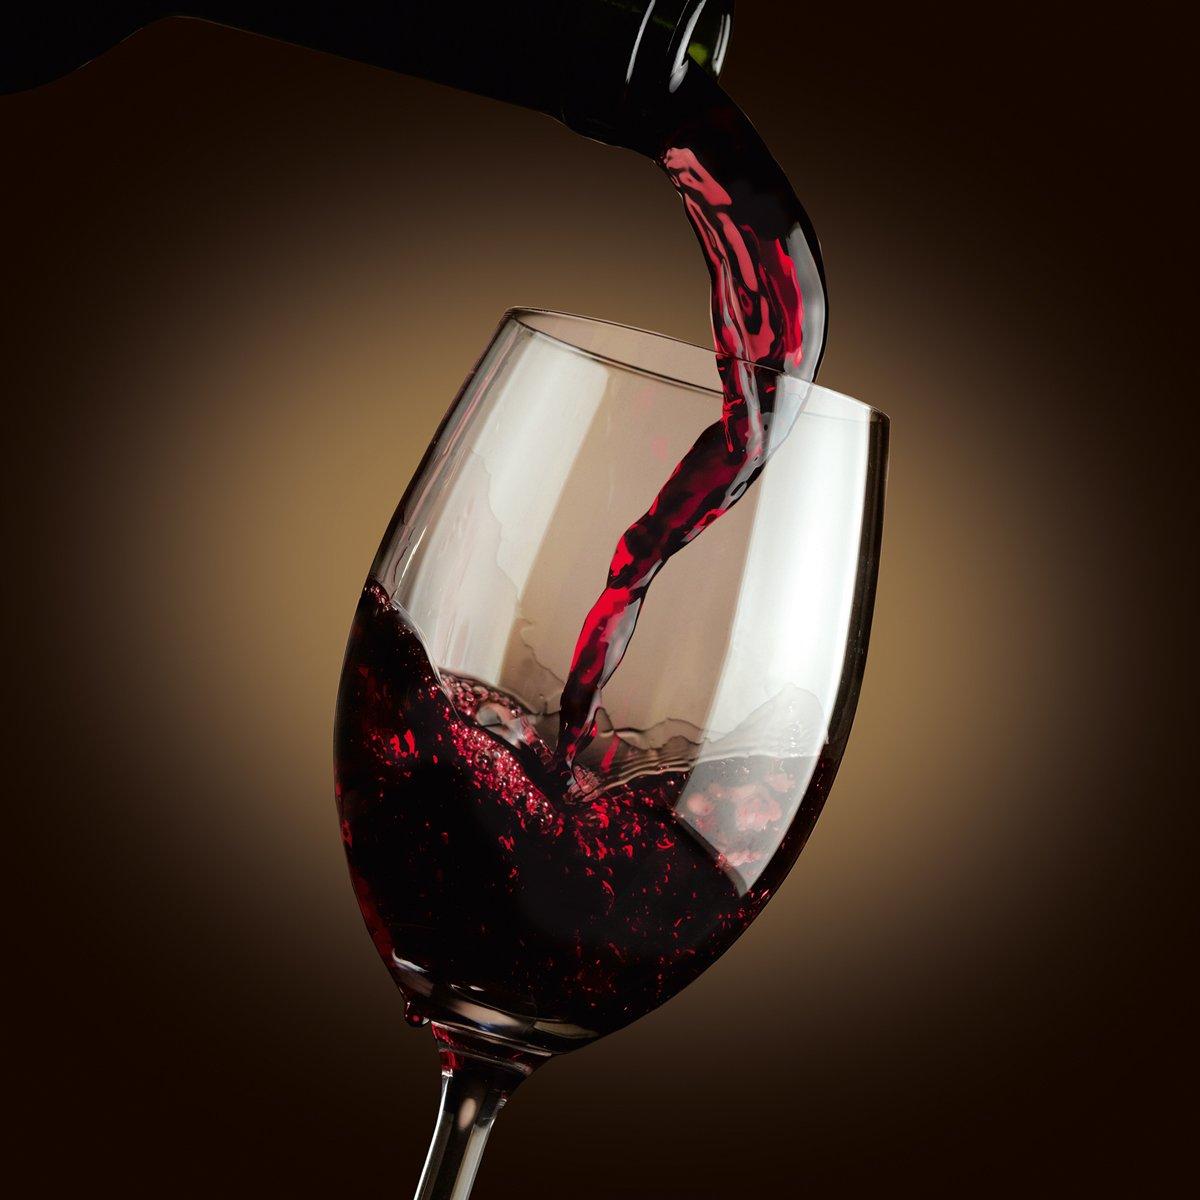 Glas 30x30x2 cm Eurographics Dark Flowing Red Wine 30x30 DecoGlass